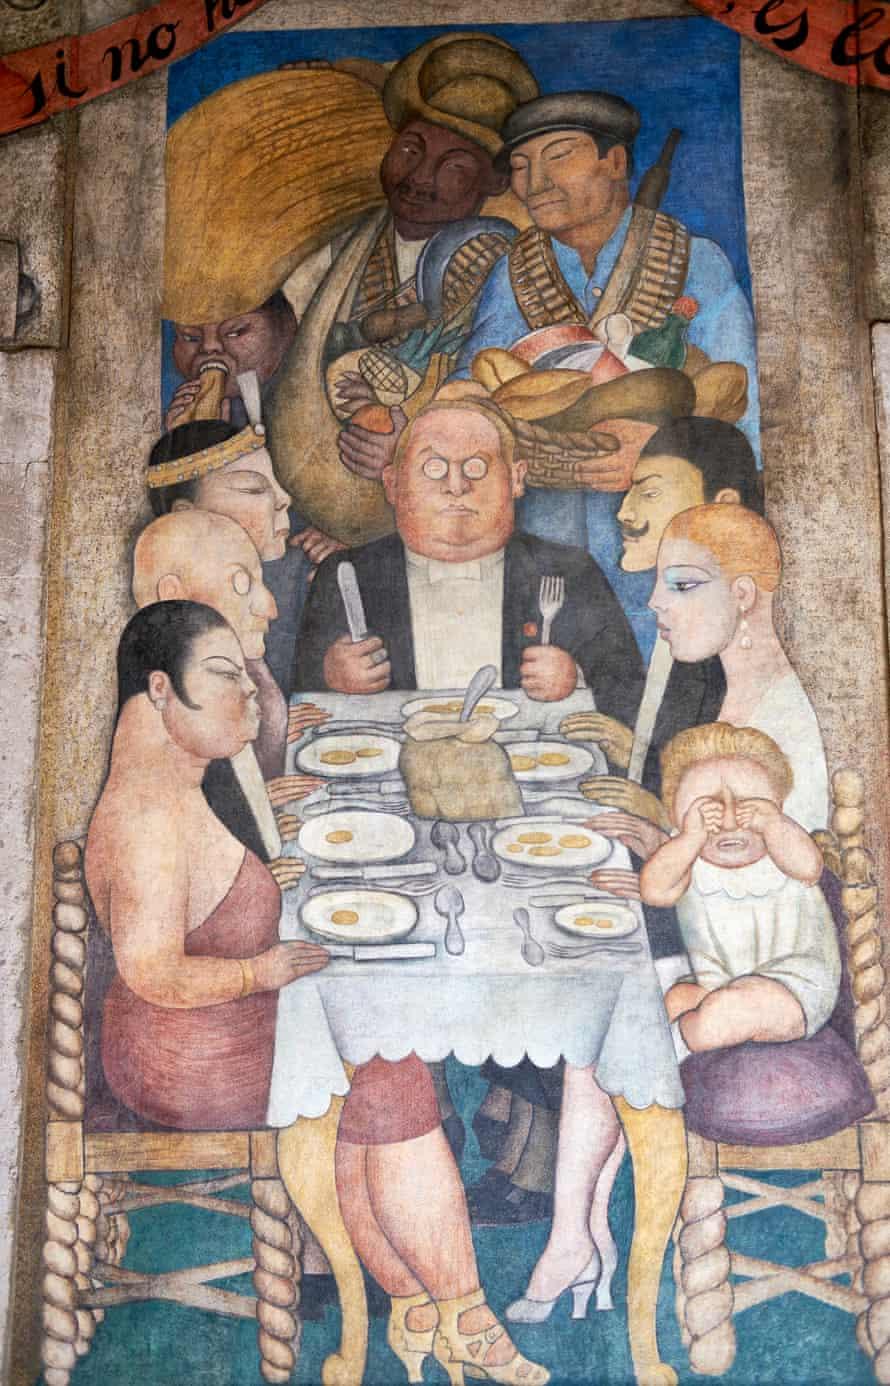 Diego Rivera Murals (detail), Mexico City